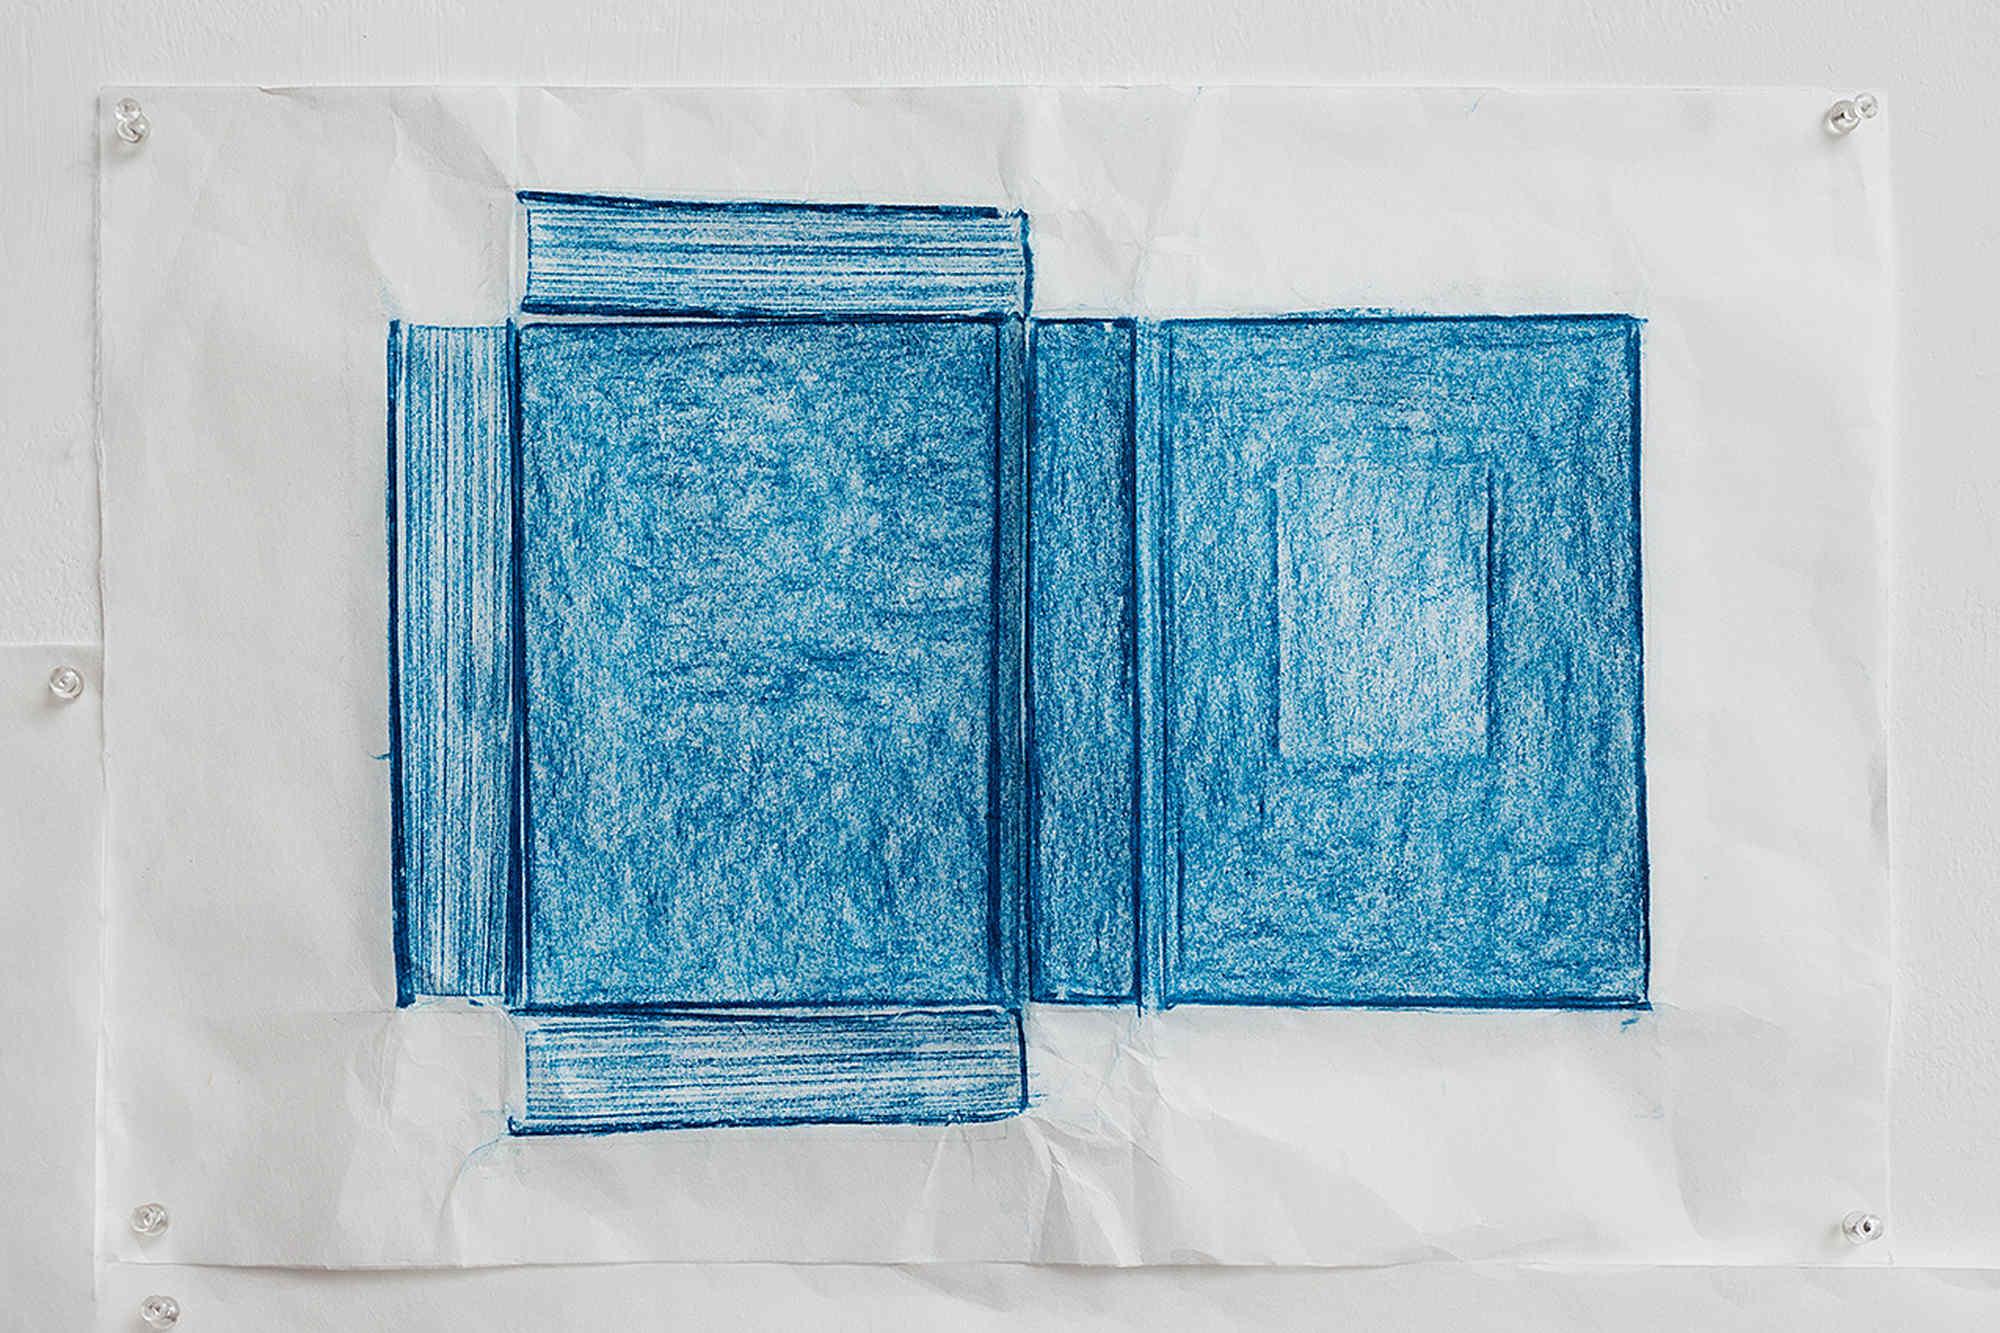 Jennifer Bornstein, Printed Matter, rubbing (encaustic and wax on Kozo paper), 32x48.5 cm, unique